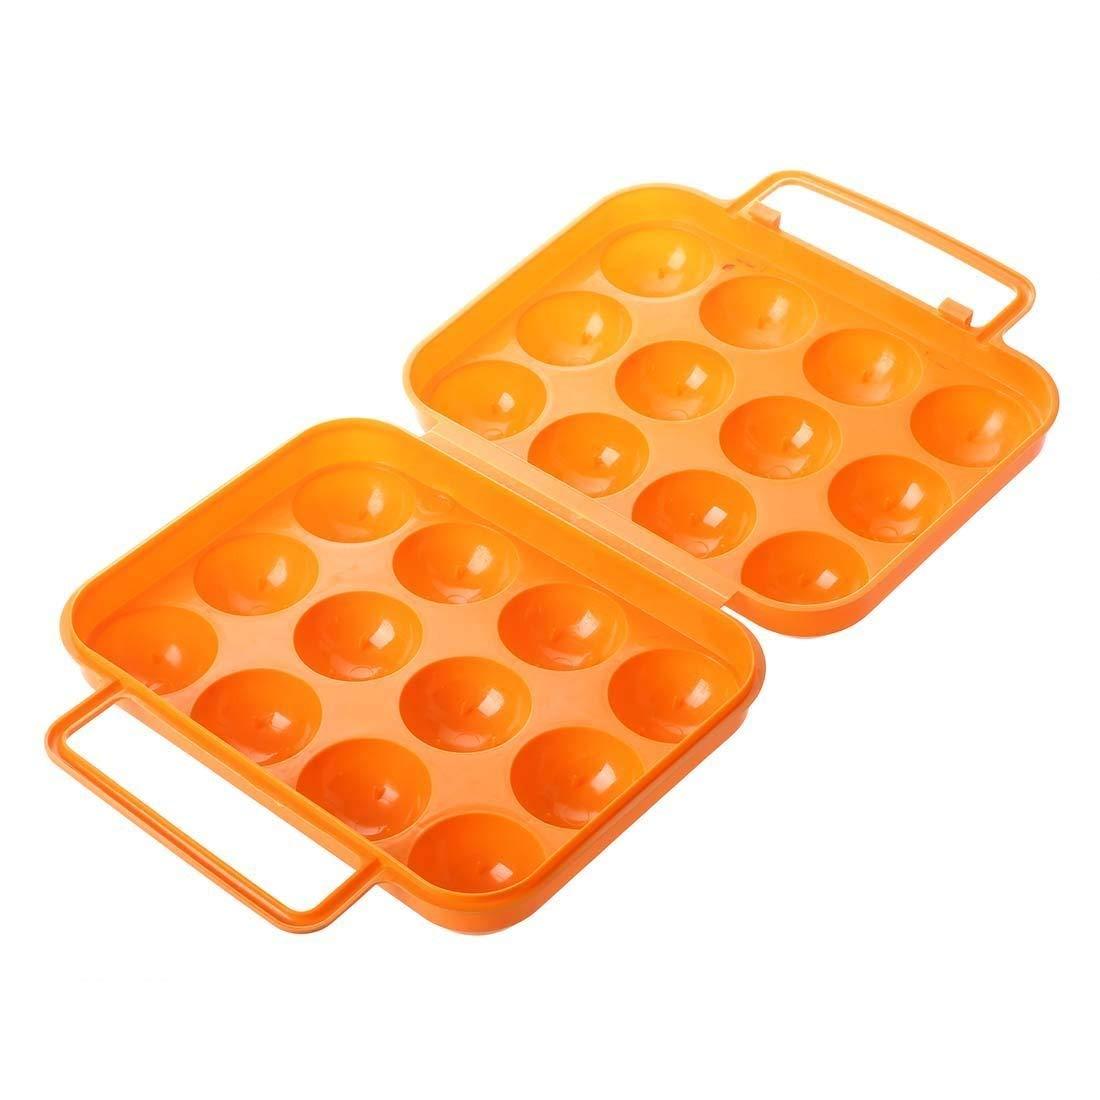 LUQUAN Portable Folding Plastic Egg Carrier Holder Storage Container-Orange